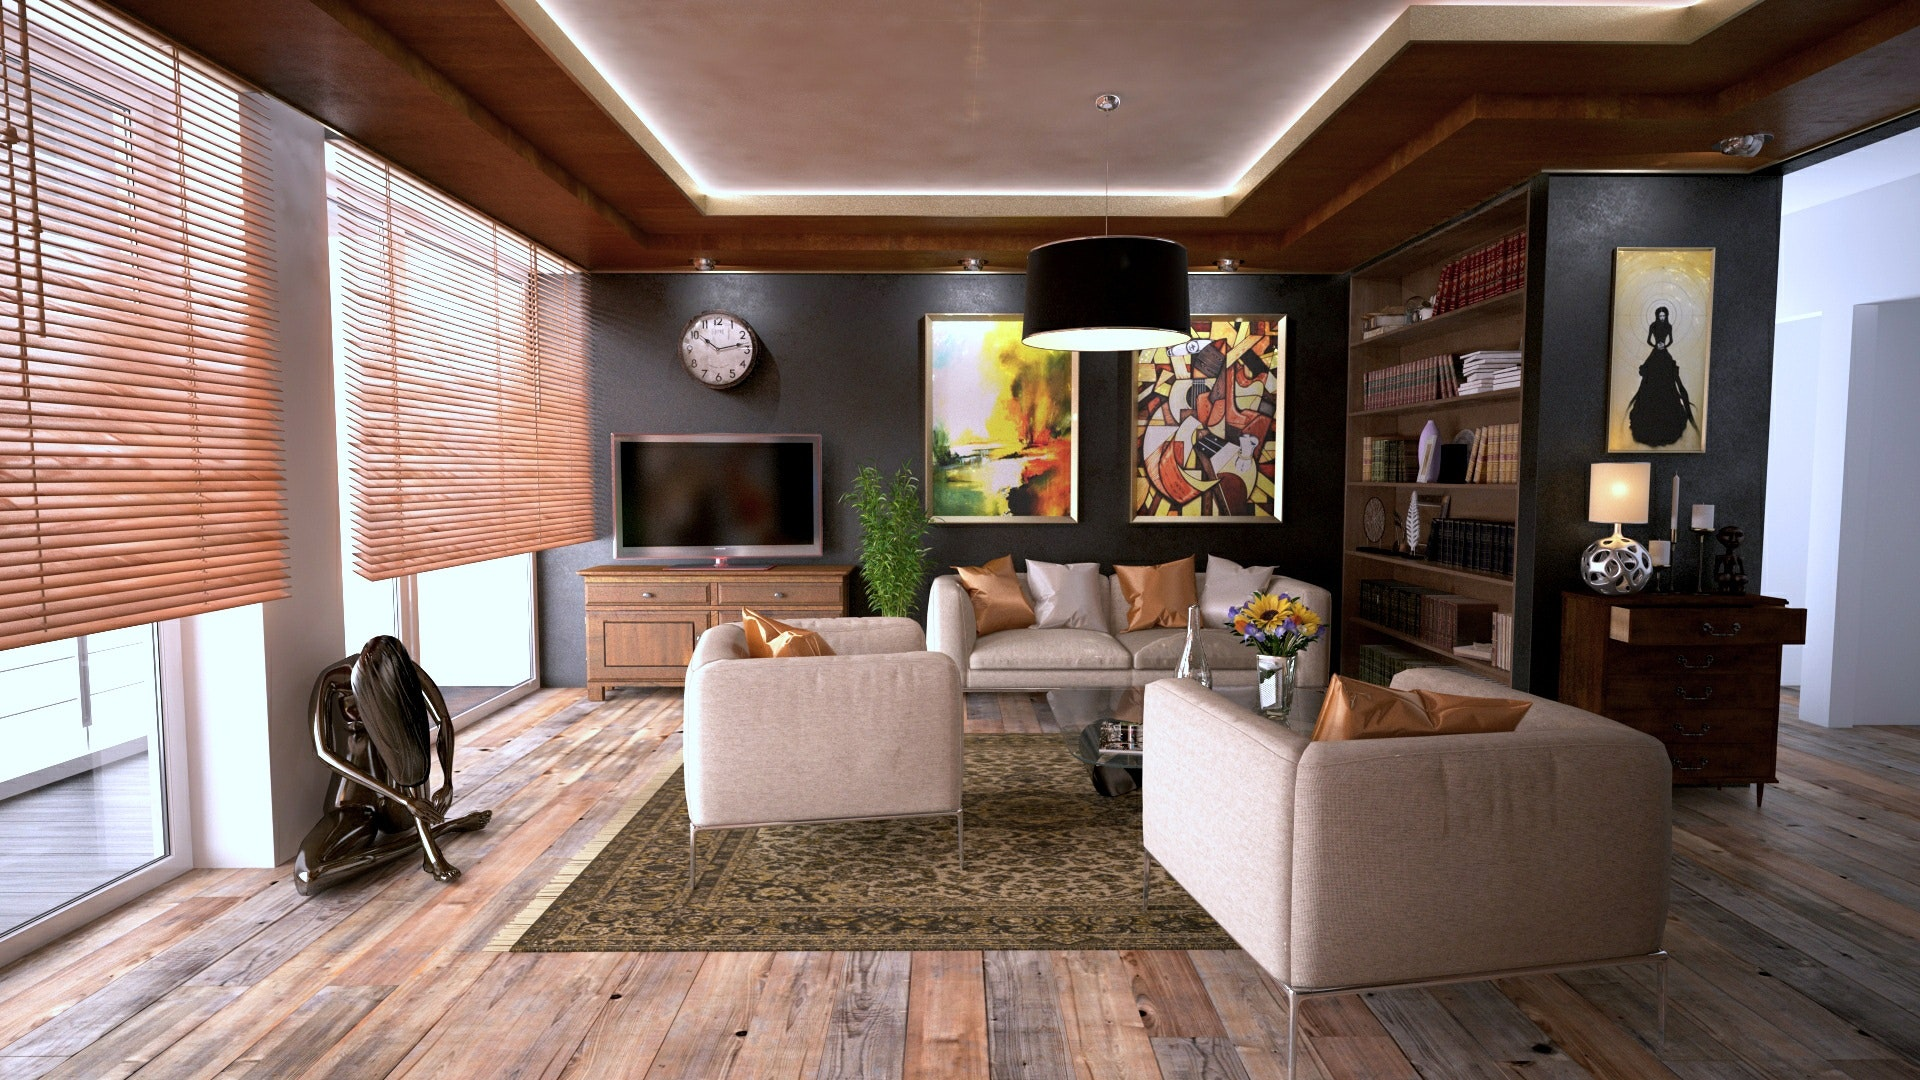 Marvelous 1000+ Engaging Interior Design Photos